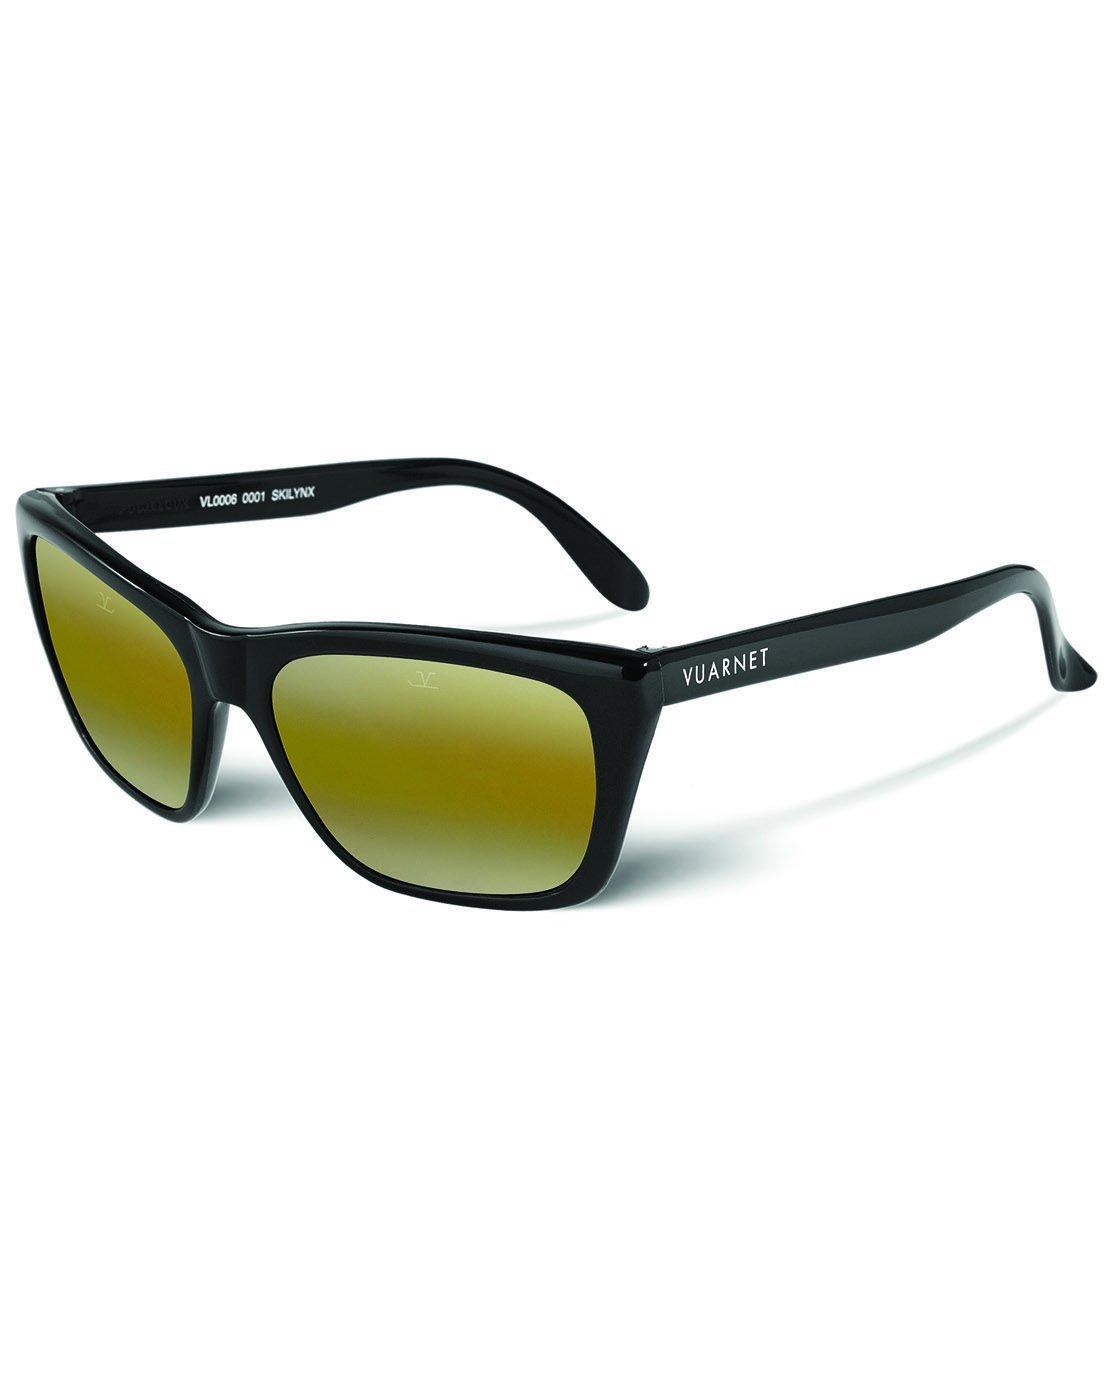 Vuarnet 006 Sunglasses : 하이아마존 - 네이버쇼핑